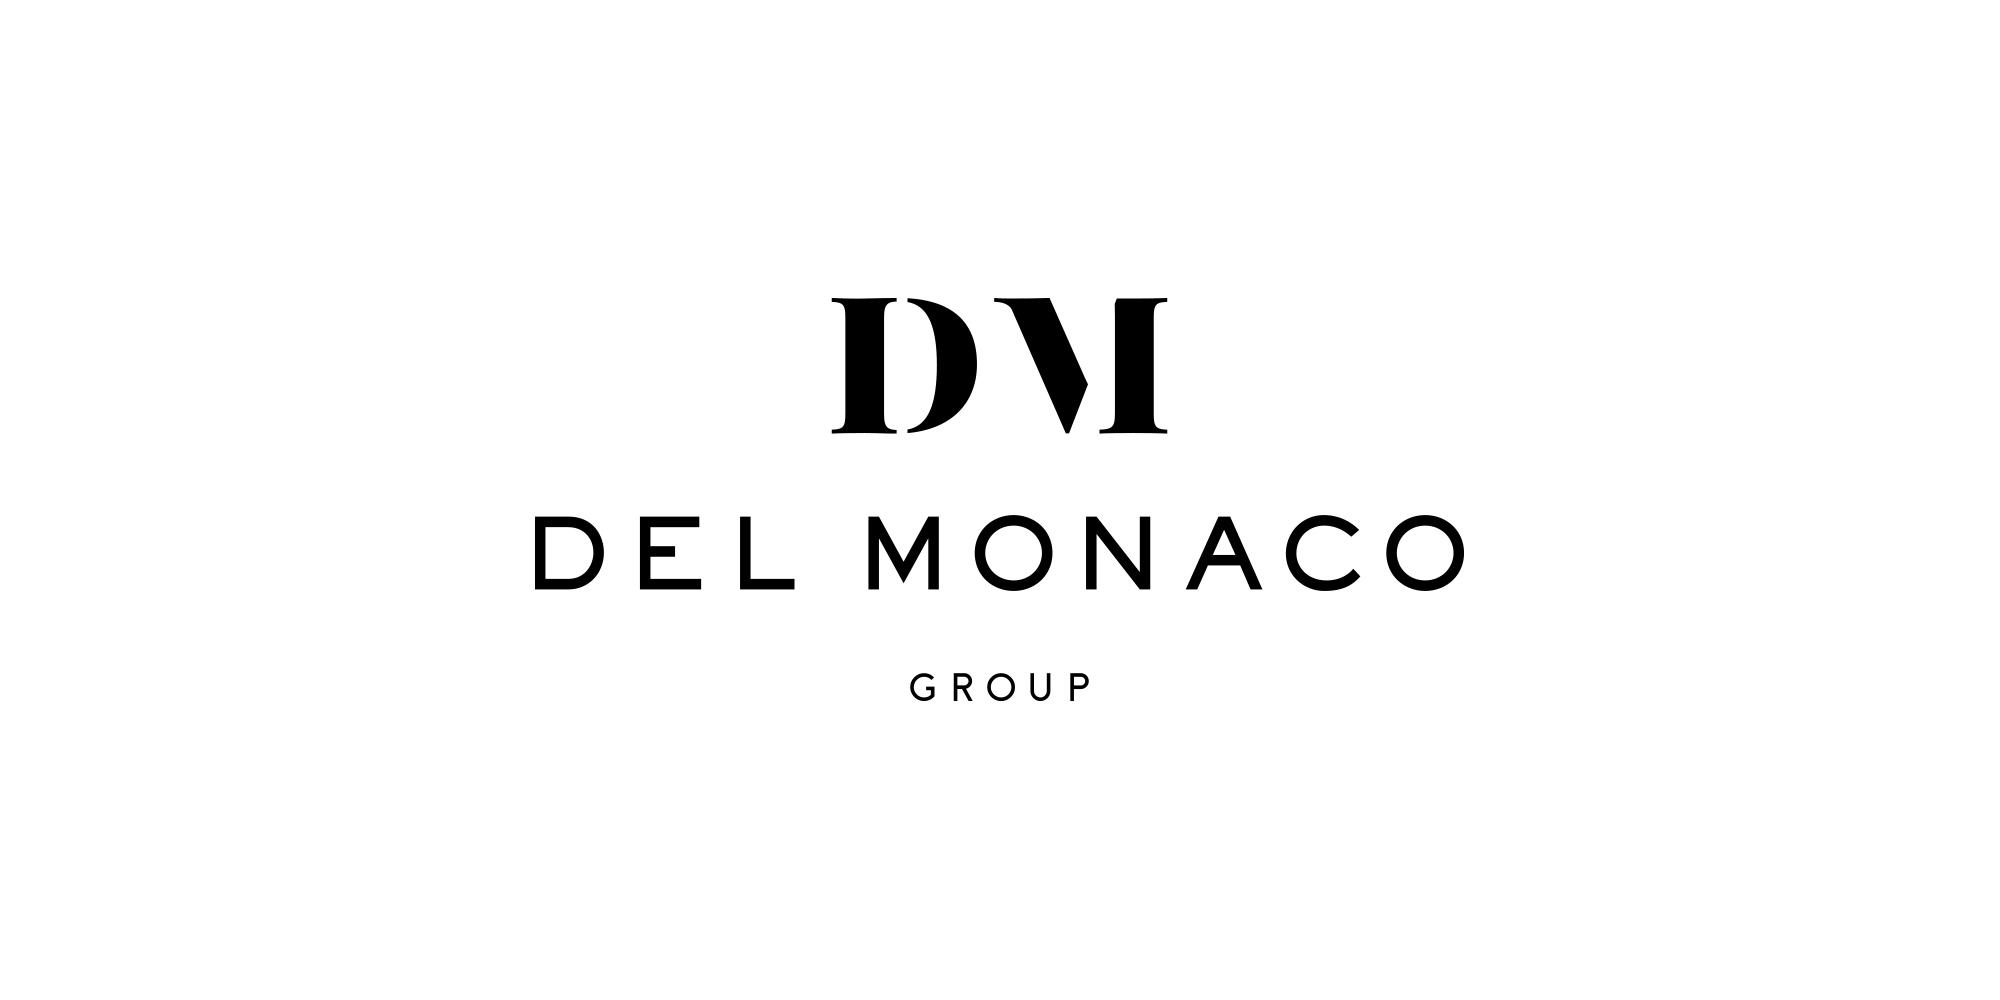 Del Monaco Group Branding